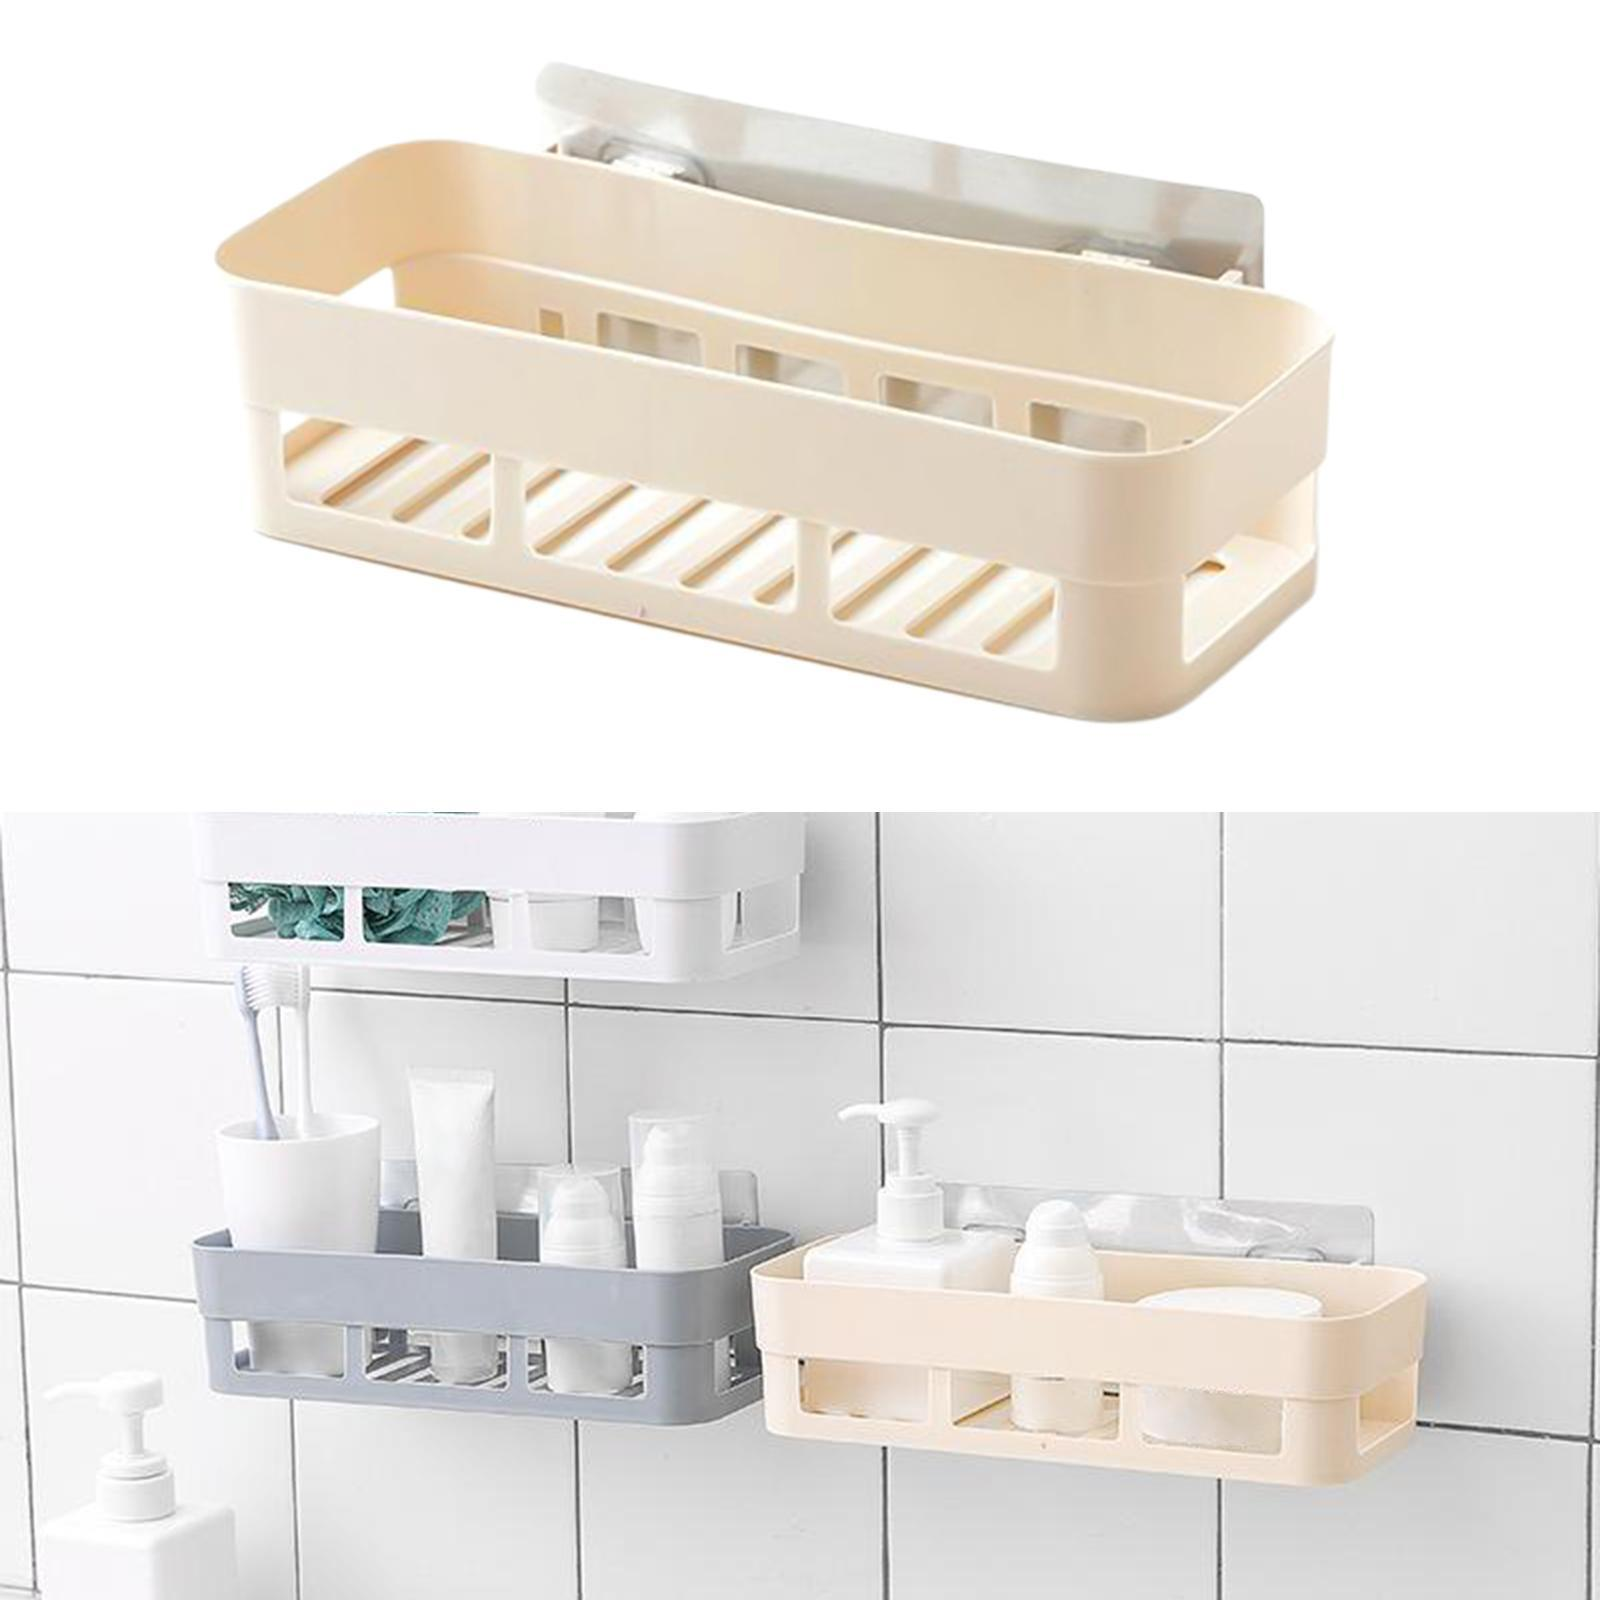 thumbnail 10 - Self-Adhesive-Shower-Shelf-Plastic-Shower-Caddy-Organiser-Bathroom-Shelf